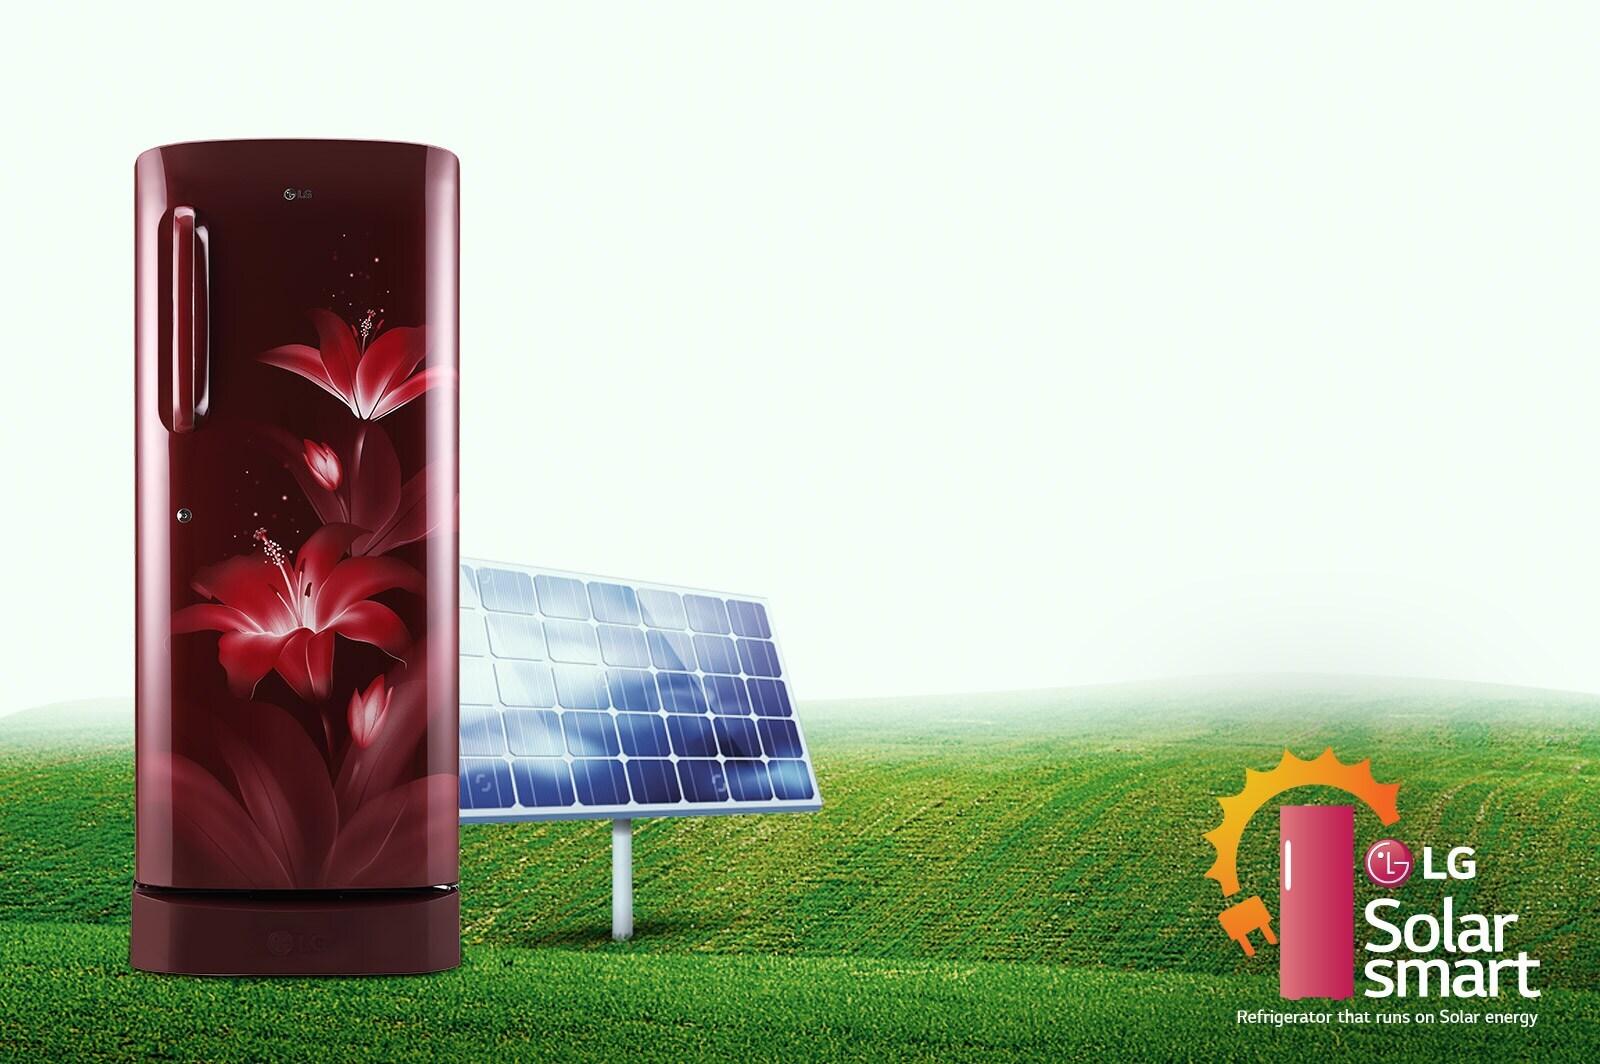 LG GL-D191KBPX 188 ltr solar smart